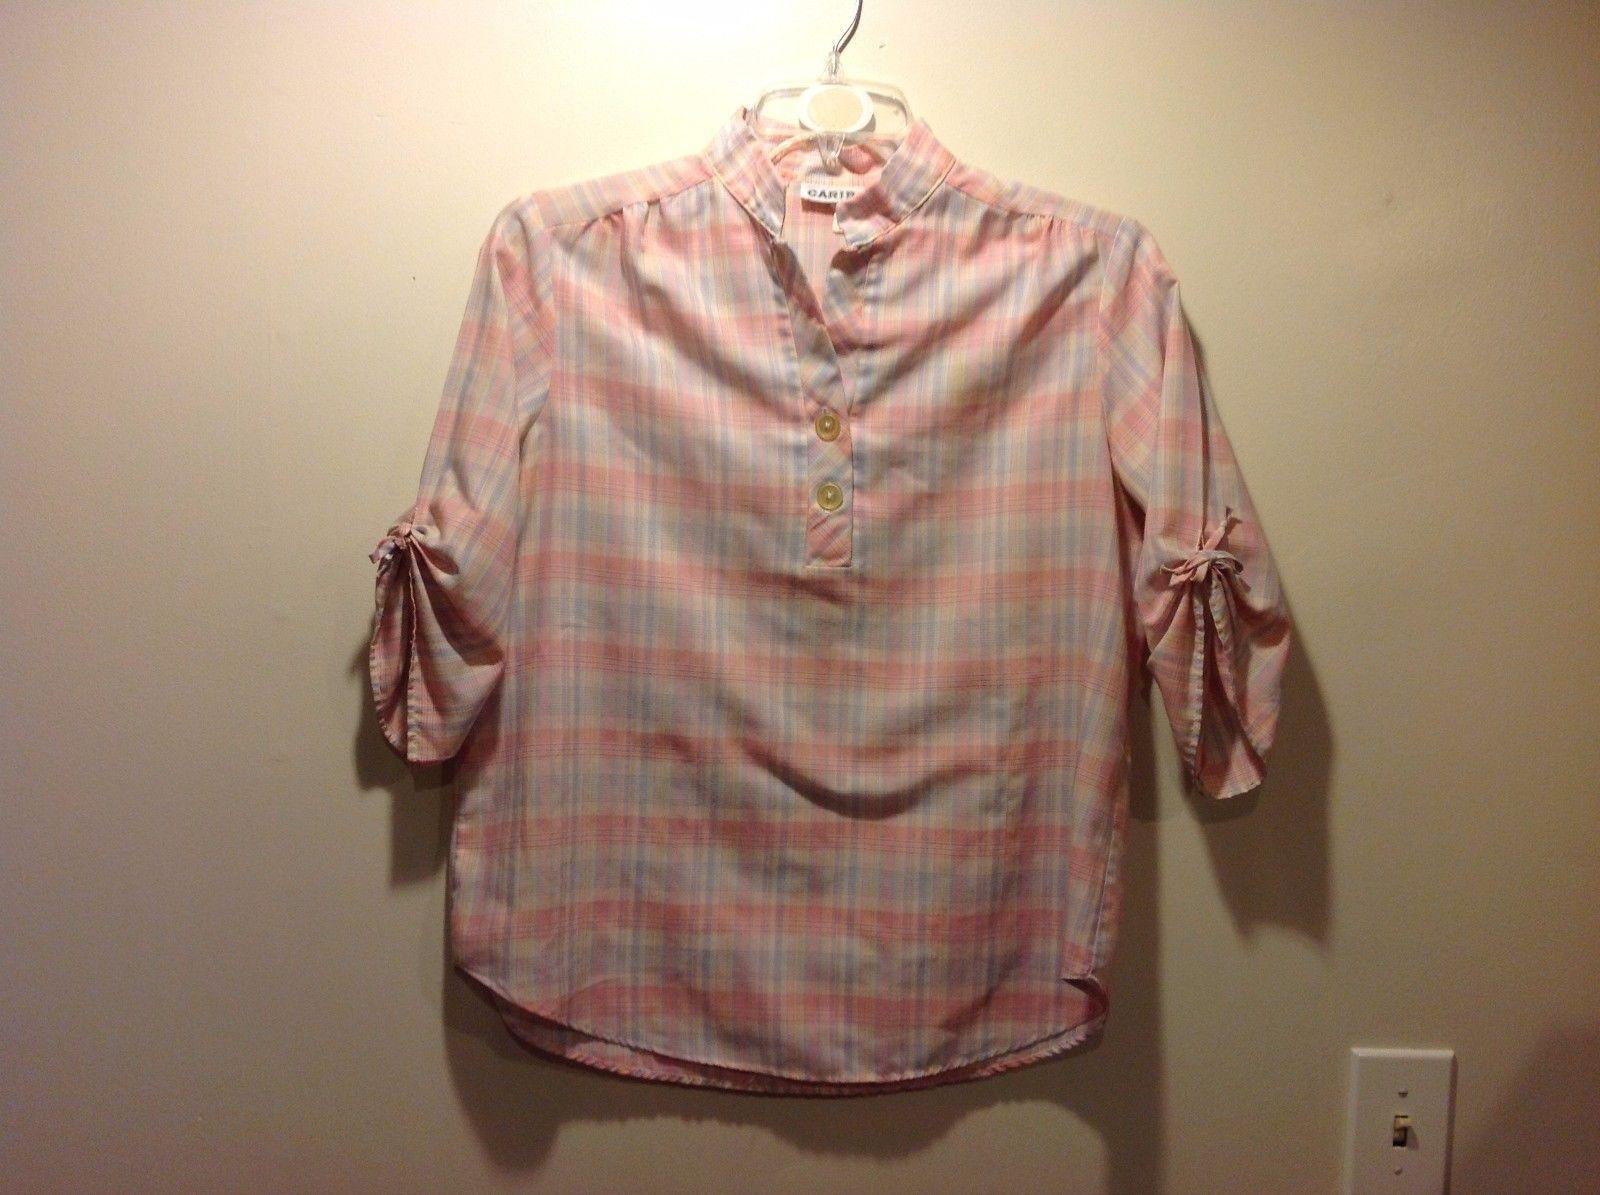 Ladies Caribou Plaid Pink Pastel Colored Pullover PJ Top Sz 16